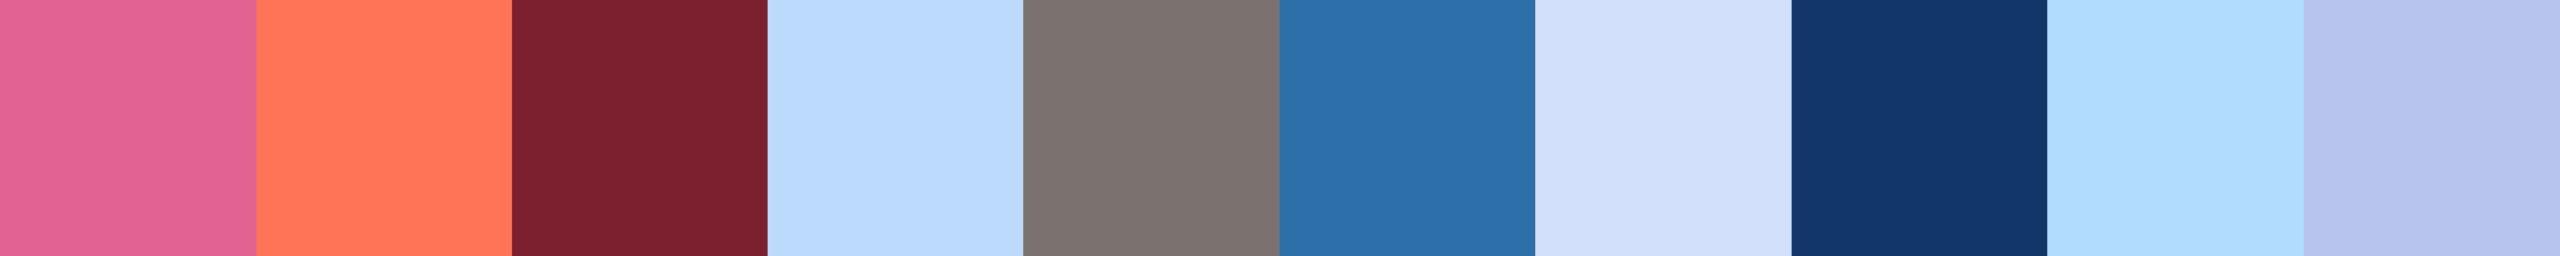 193 Koldema Color Palette